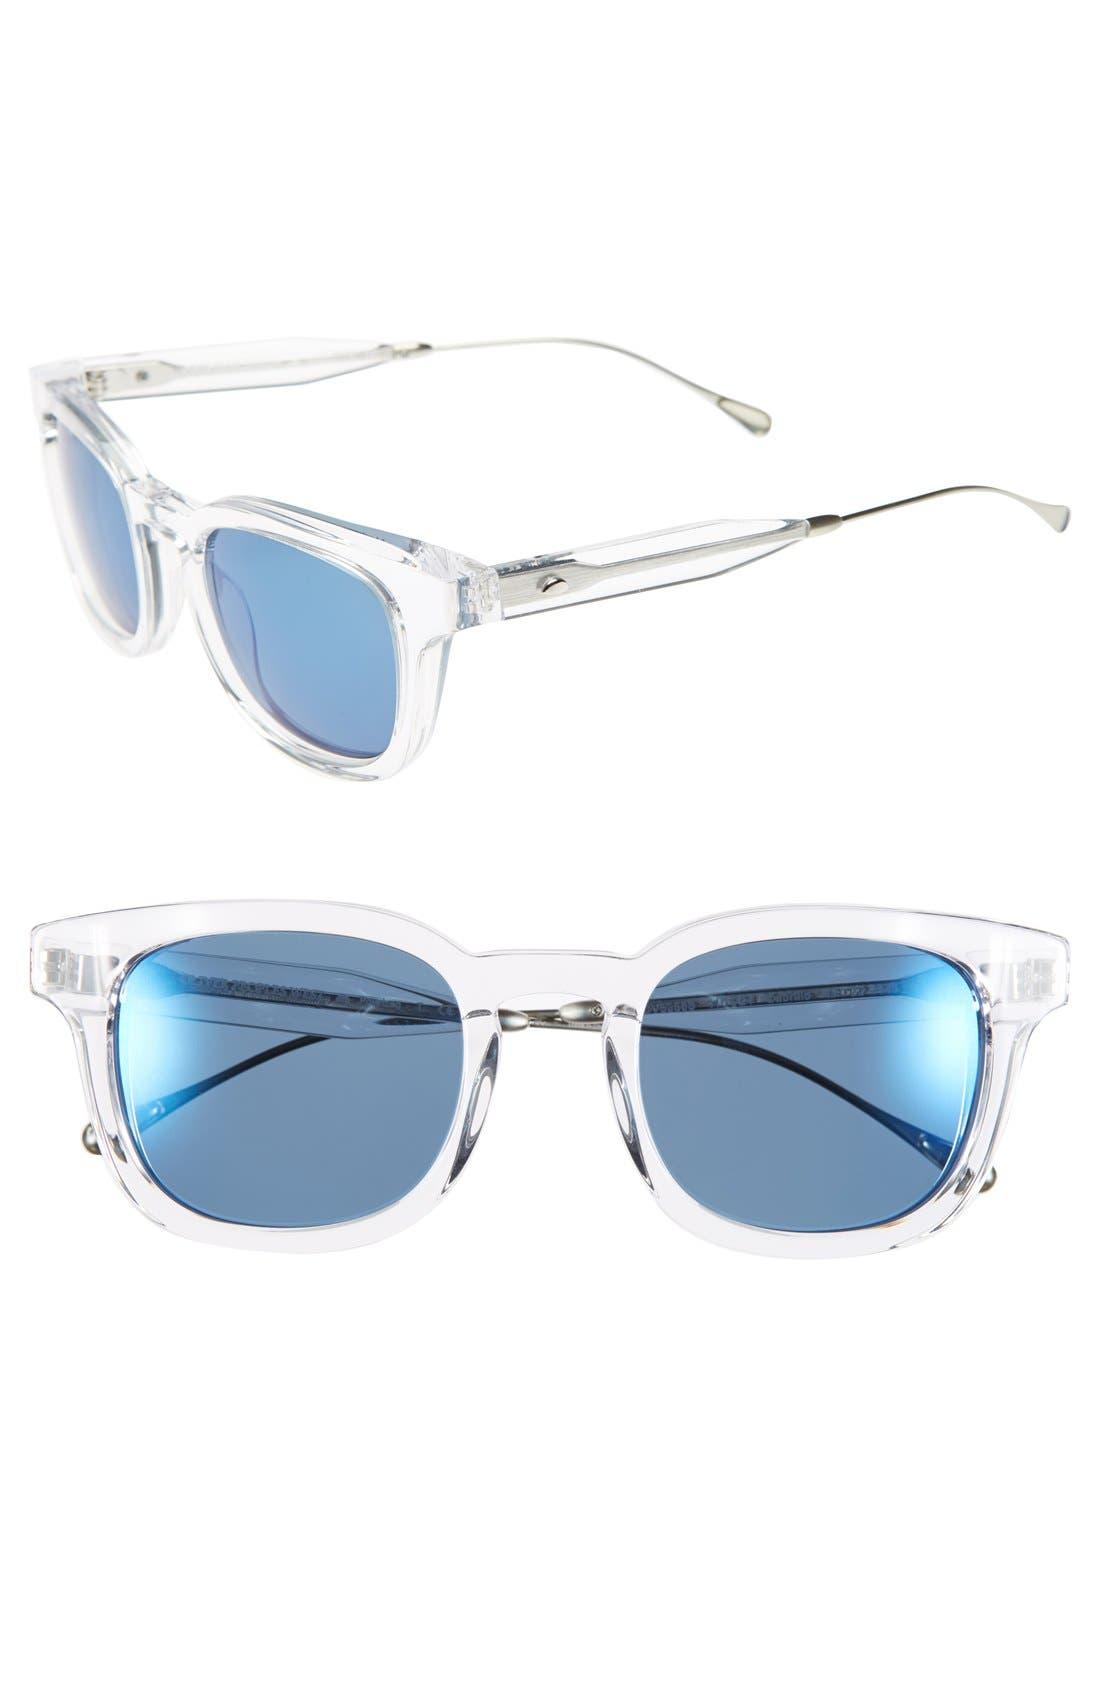 Main Image - Oliver Peoples West 'Cabrillo' 49mm Polarized Retro Sunglasses